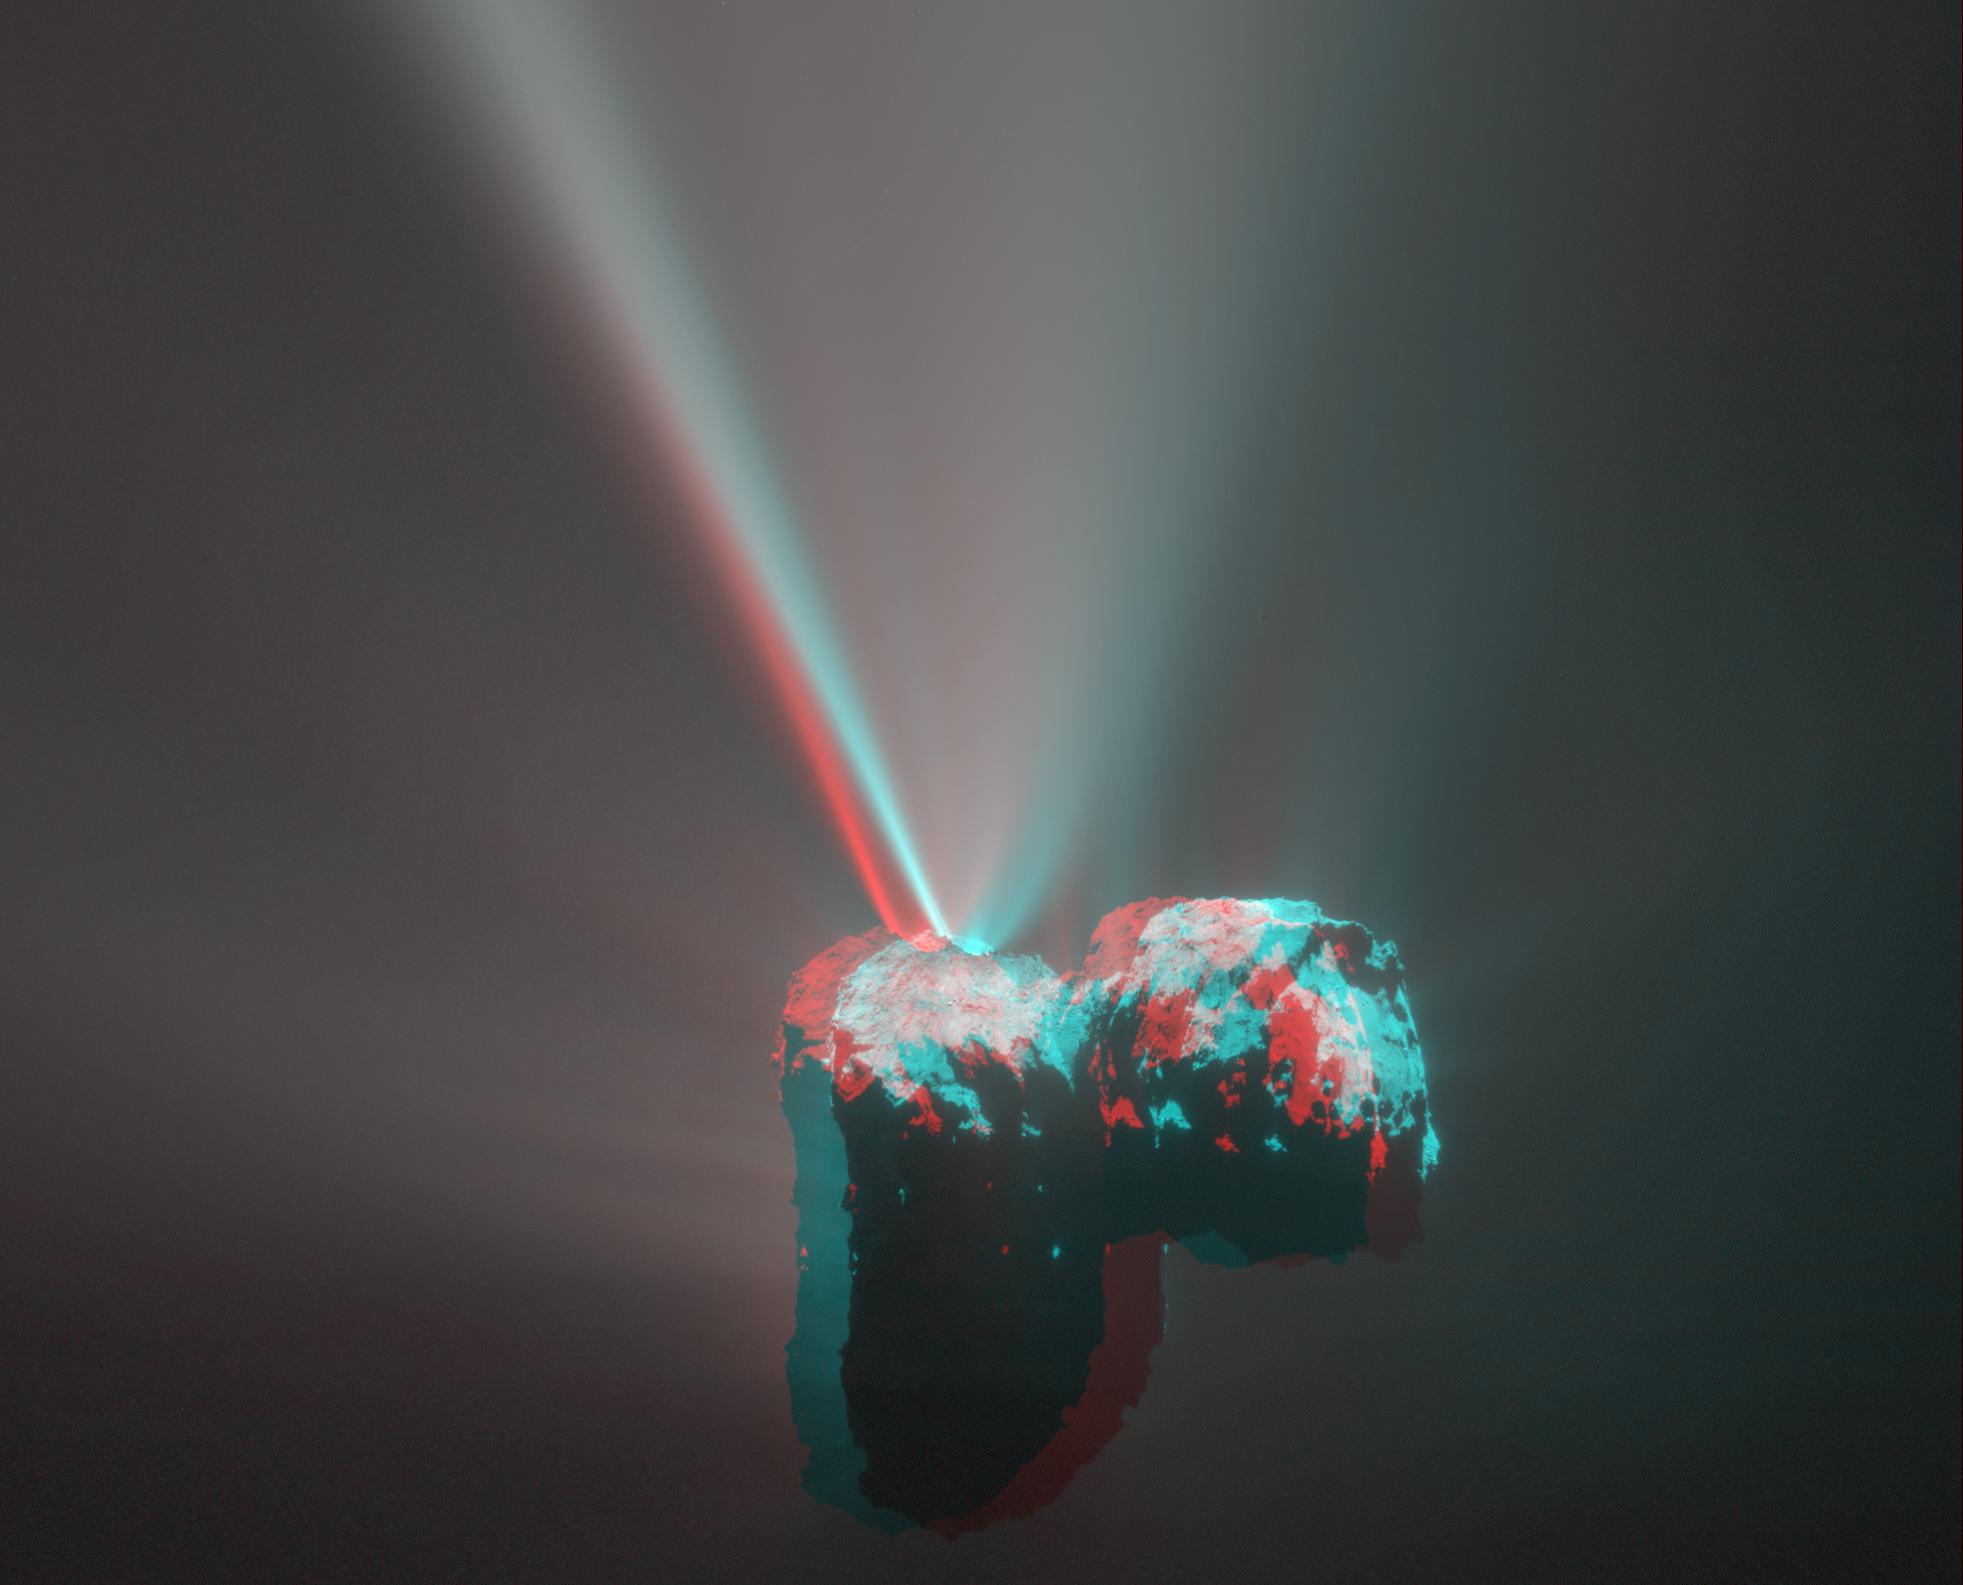 1567215890057-Rosetta_OSIRIS_Comet_67P_jet_in_3D.png